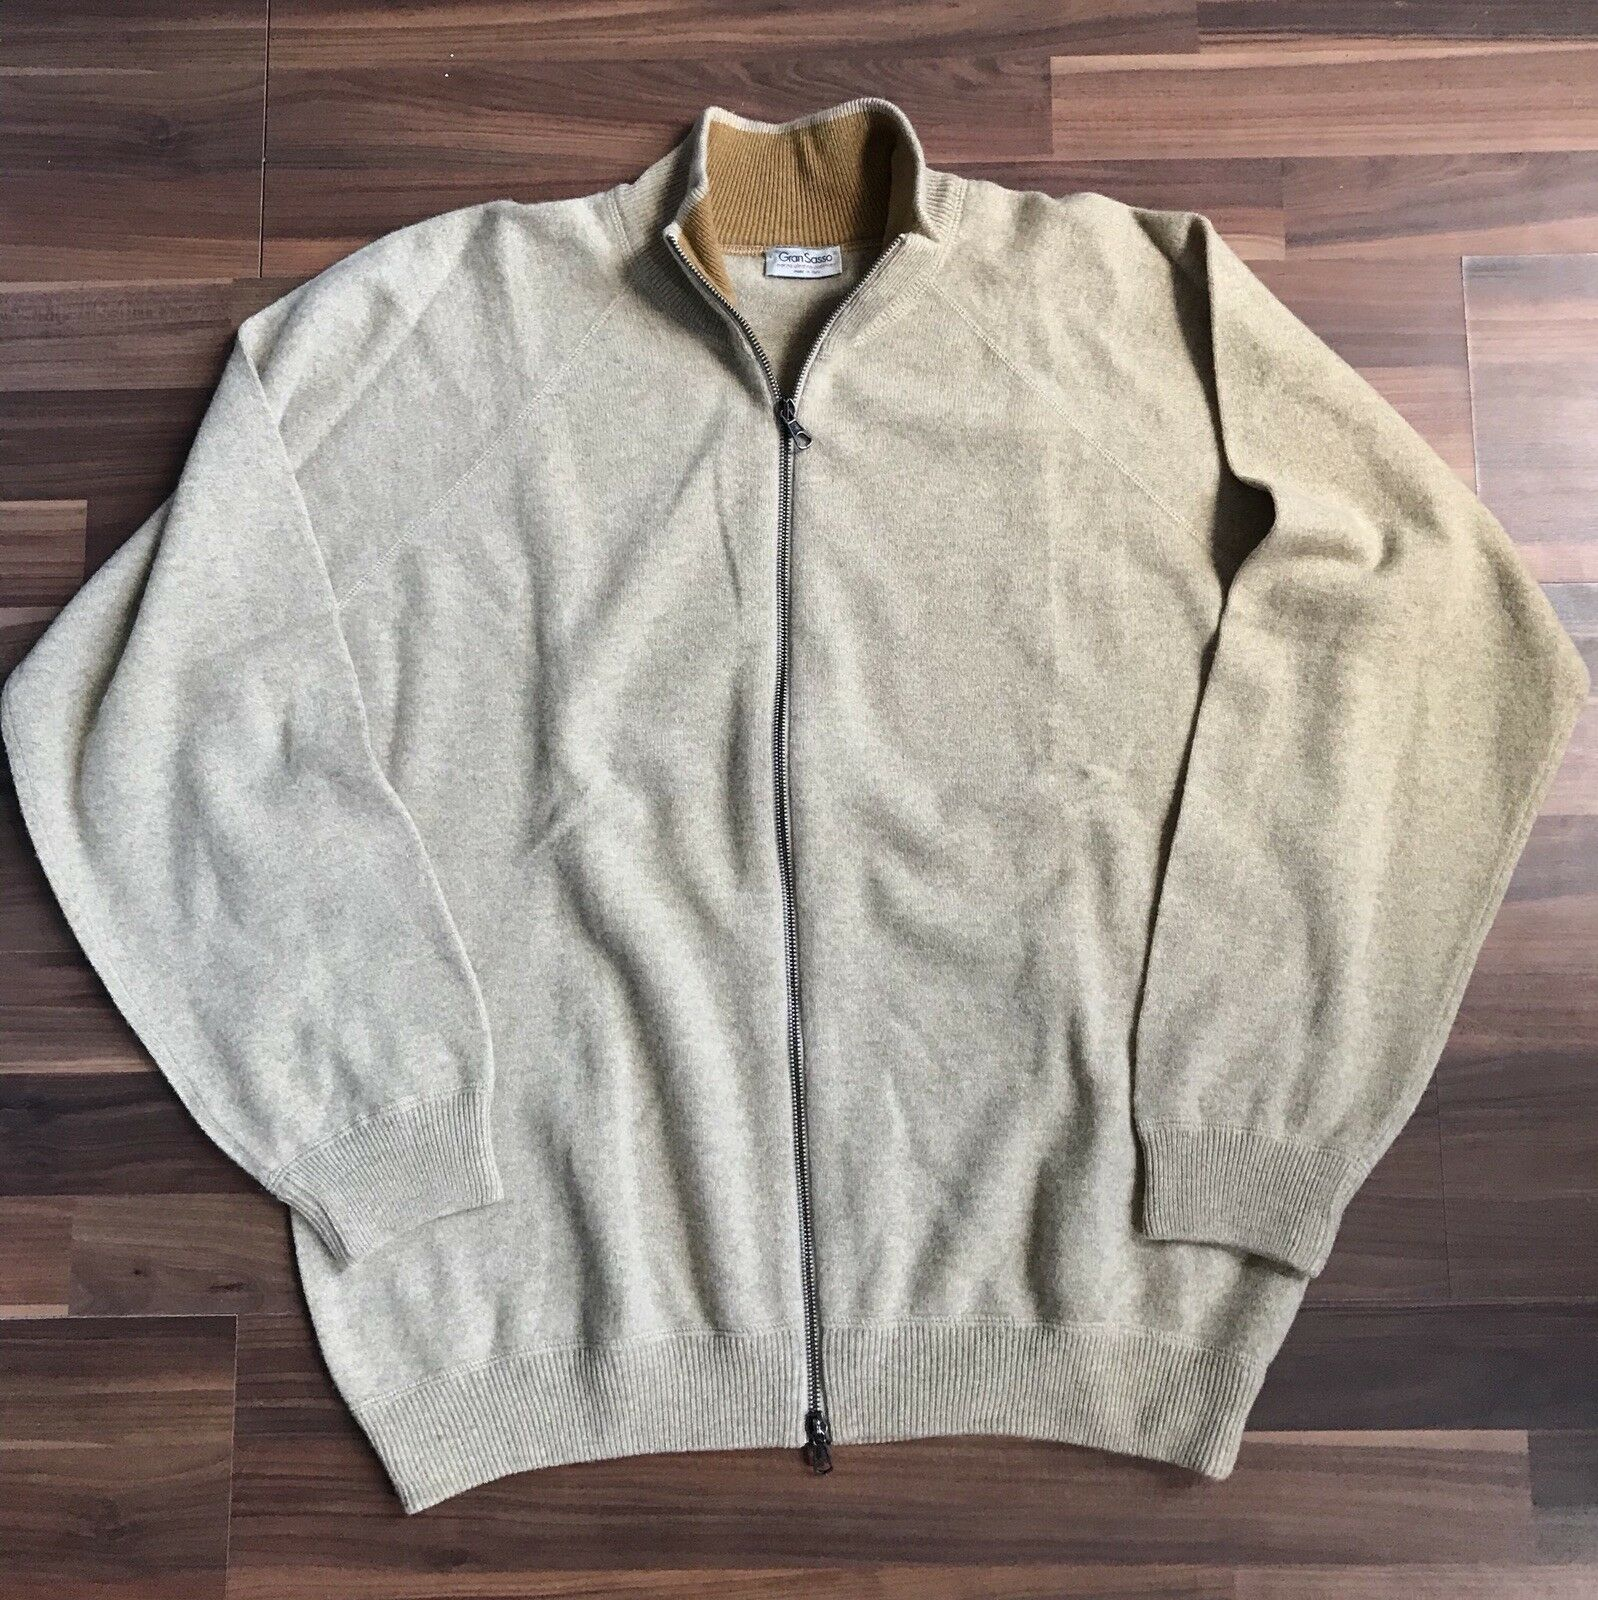 Gran Sasso Merino Cashmere Blend Zip Up Sweater Tan Sz XL